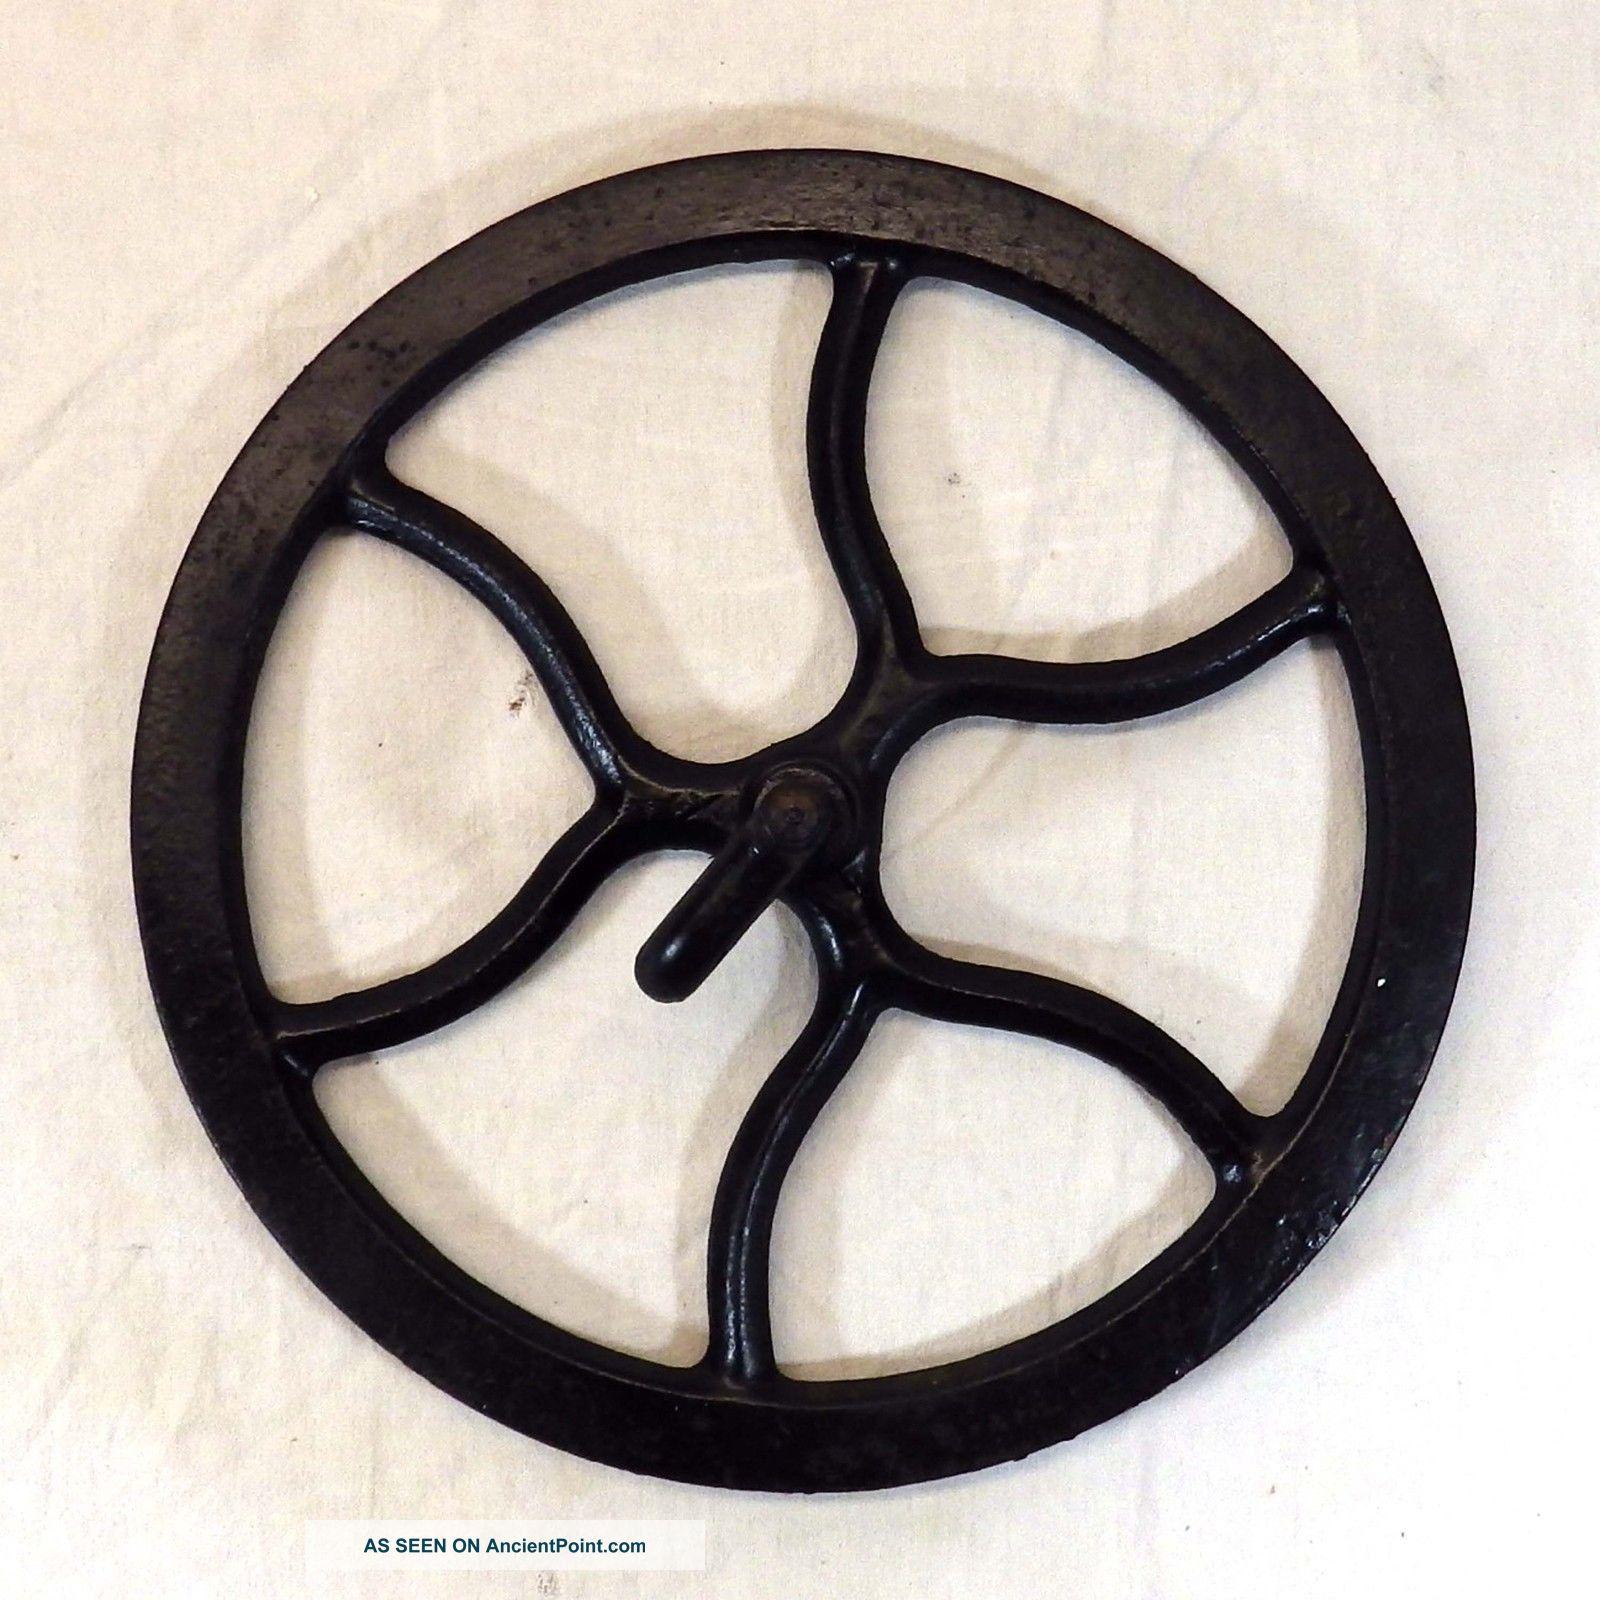 Vintage Singer Sewing Machine Treadle Table Cast Iron Metal Belt Flywheel Black Furniture photo